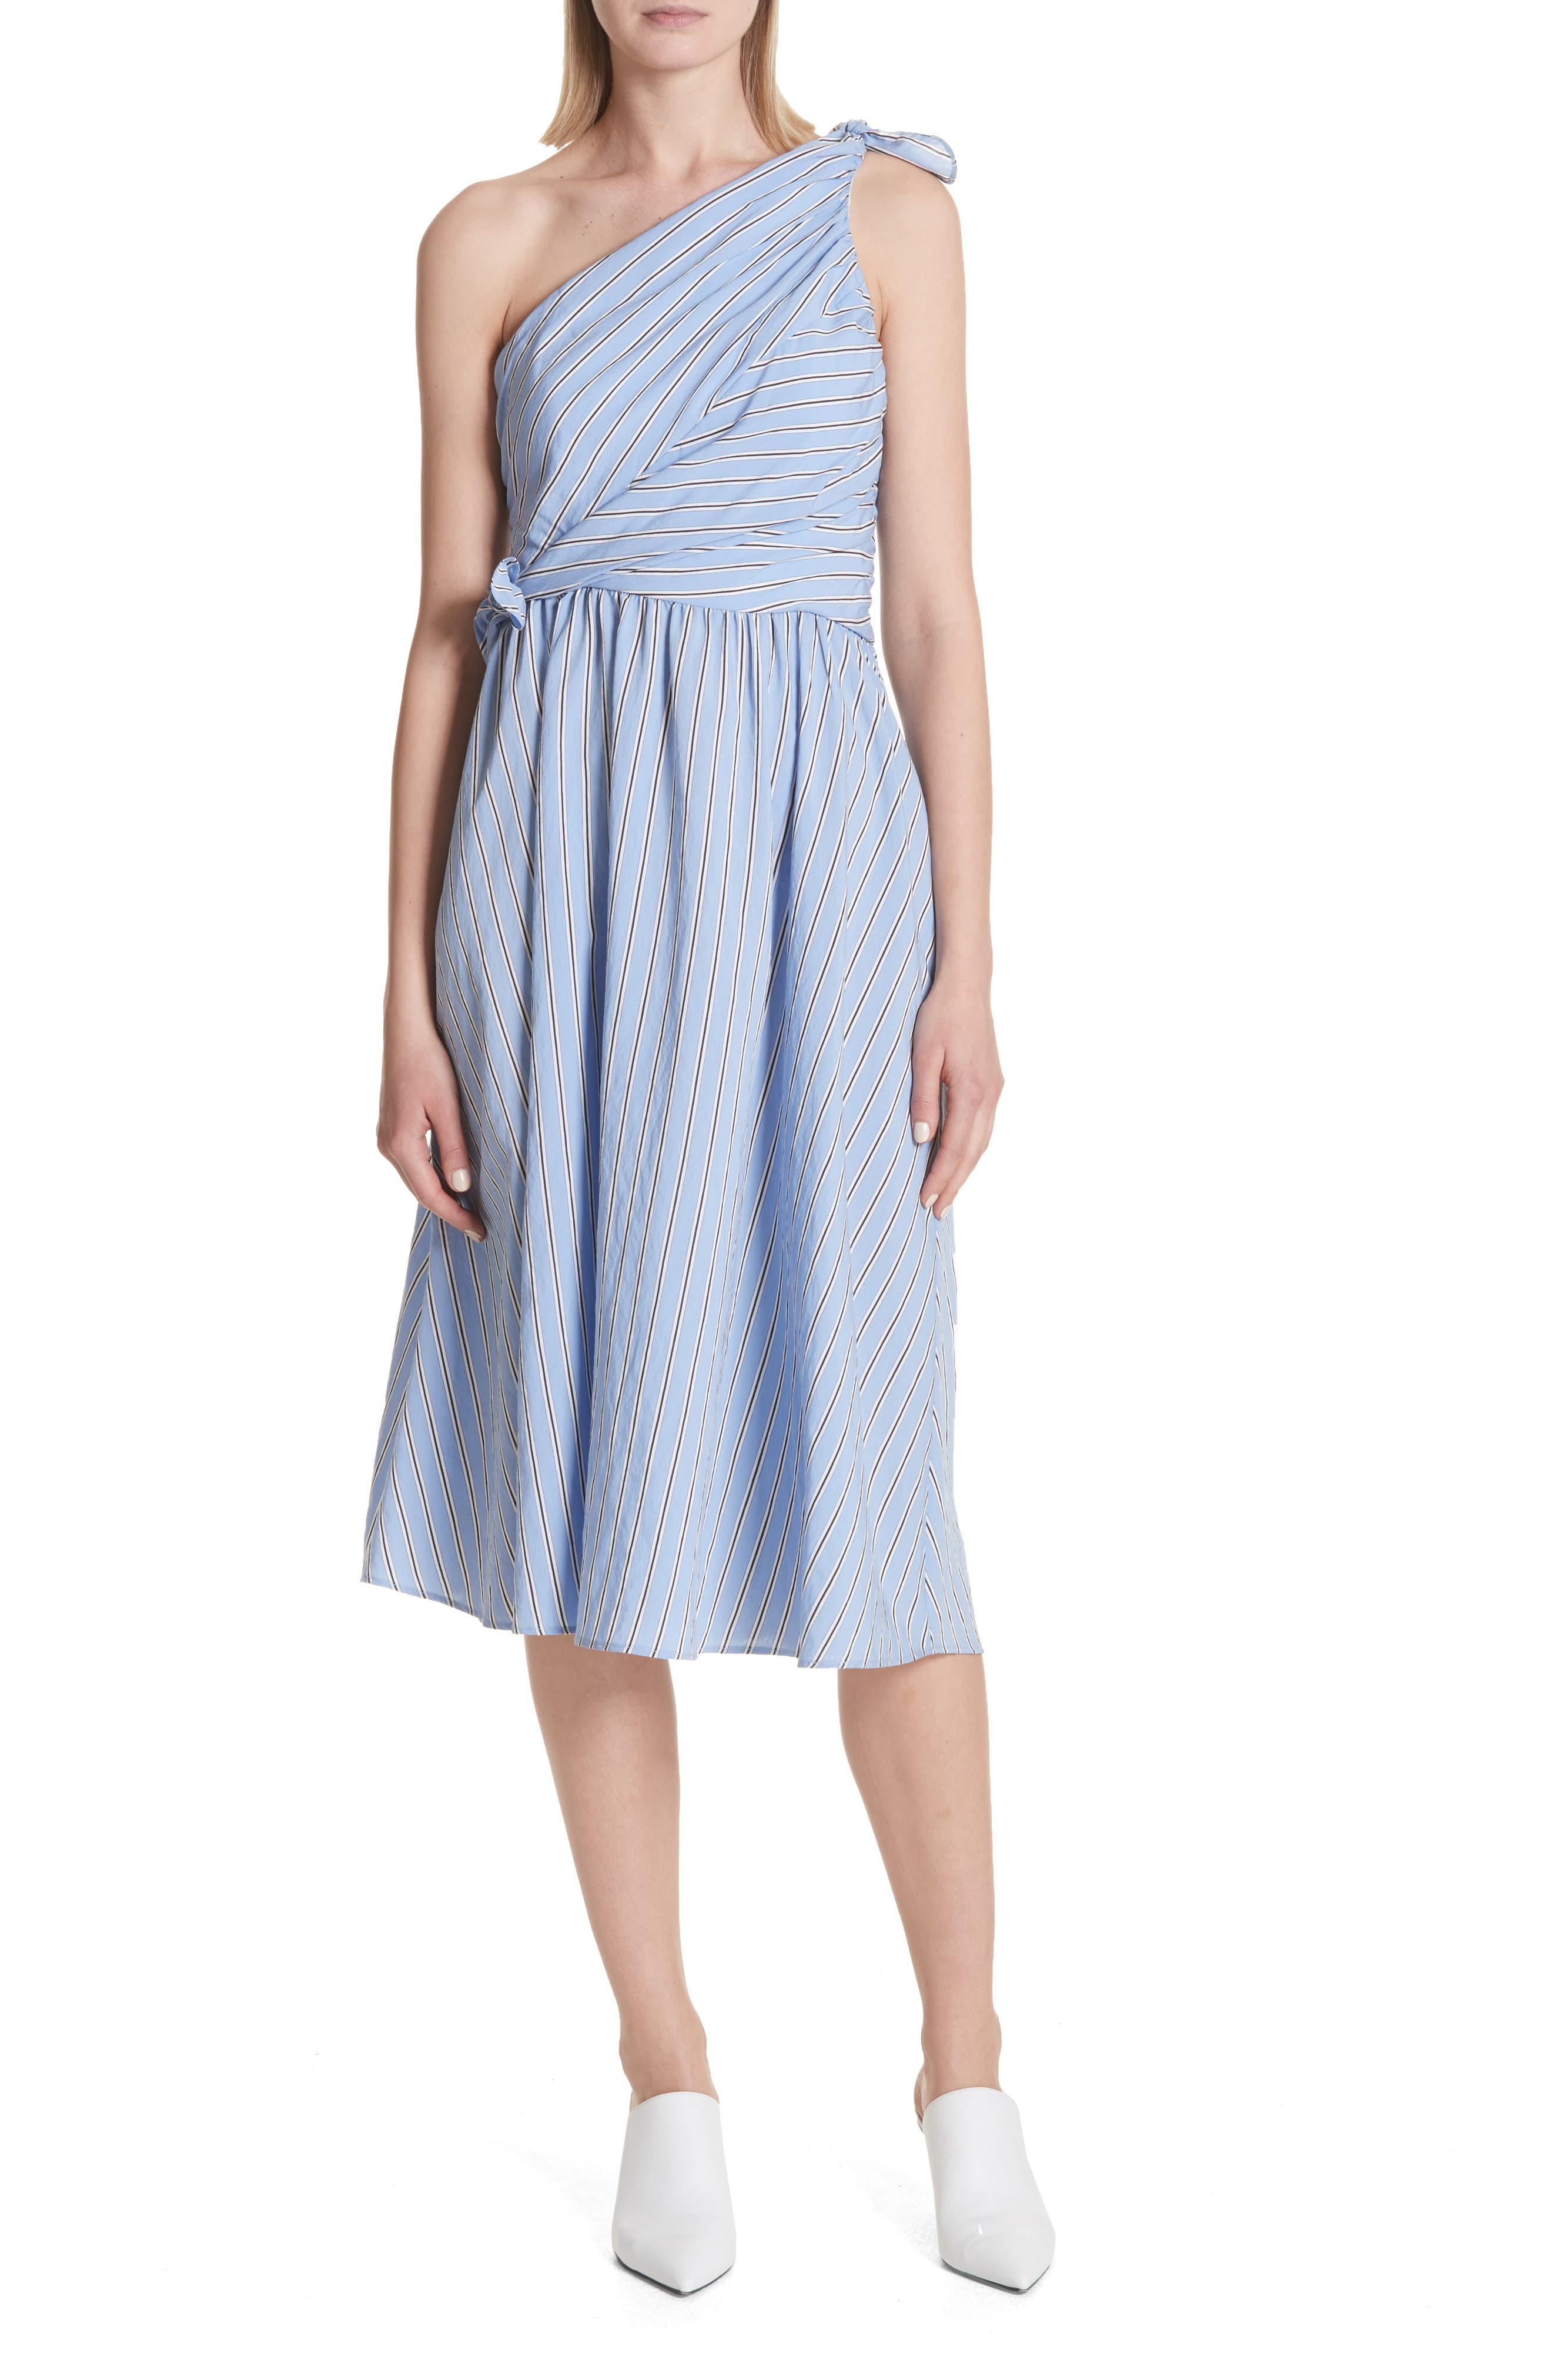 Cabrera Stripe One-Shoulder Dress,                         Main,                         color, Olxford Blue